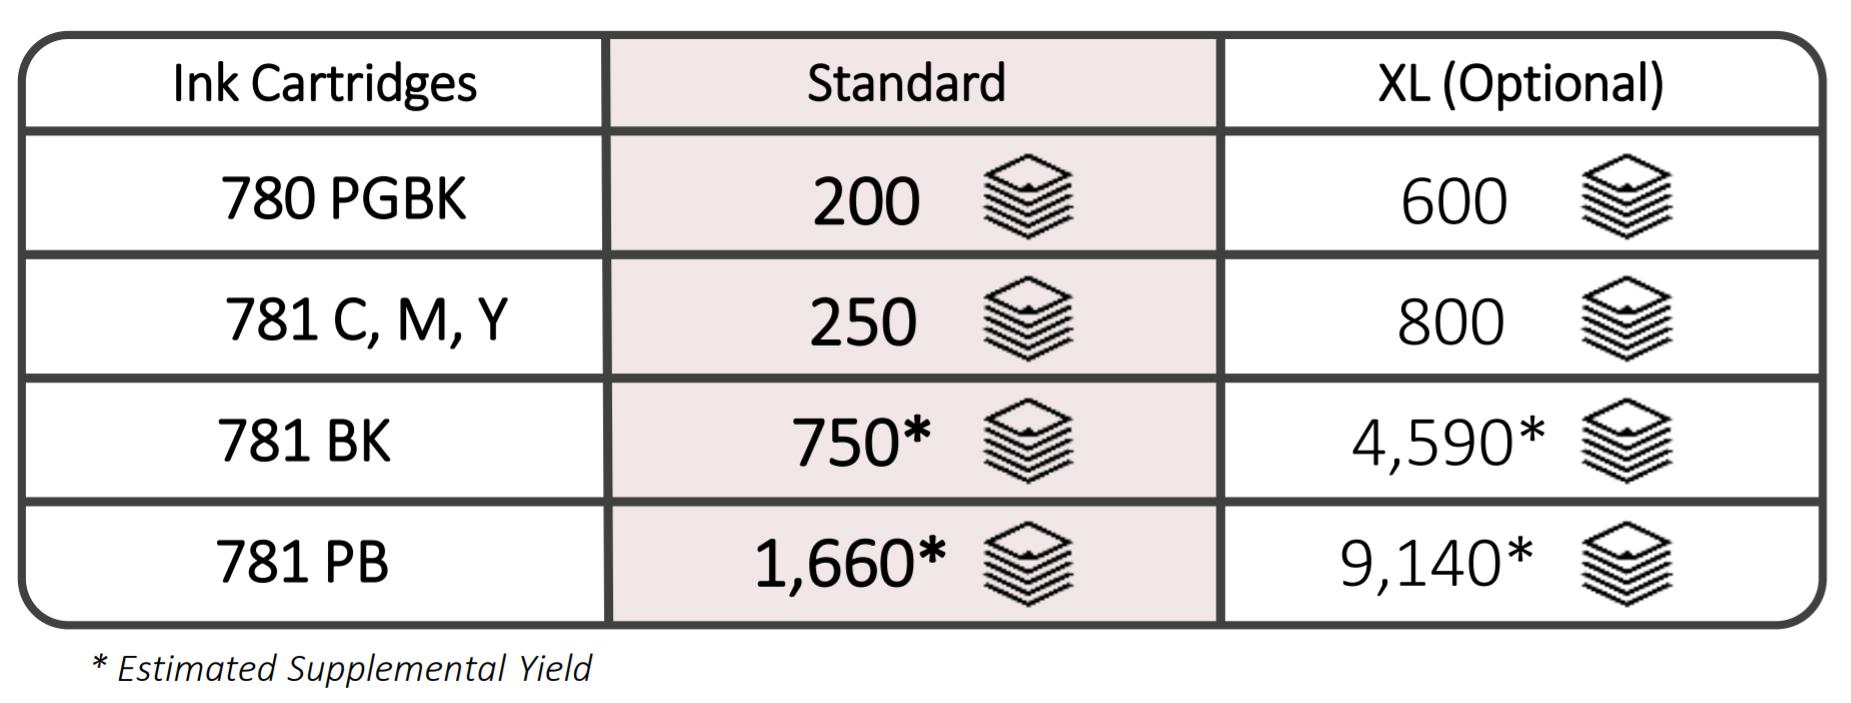 CANON PGI-780 & CLI-781 NORMAL SET CARTRIDGE (PGI-780+CLI781BK+C+M+Y+PB) for TS8170/TS8270/TS8370/TS9170 Printer